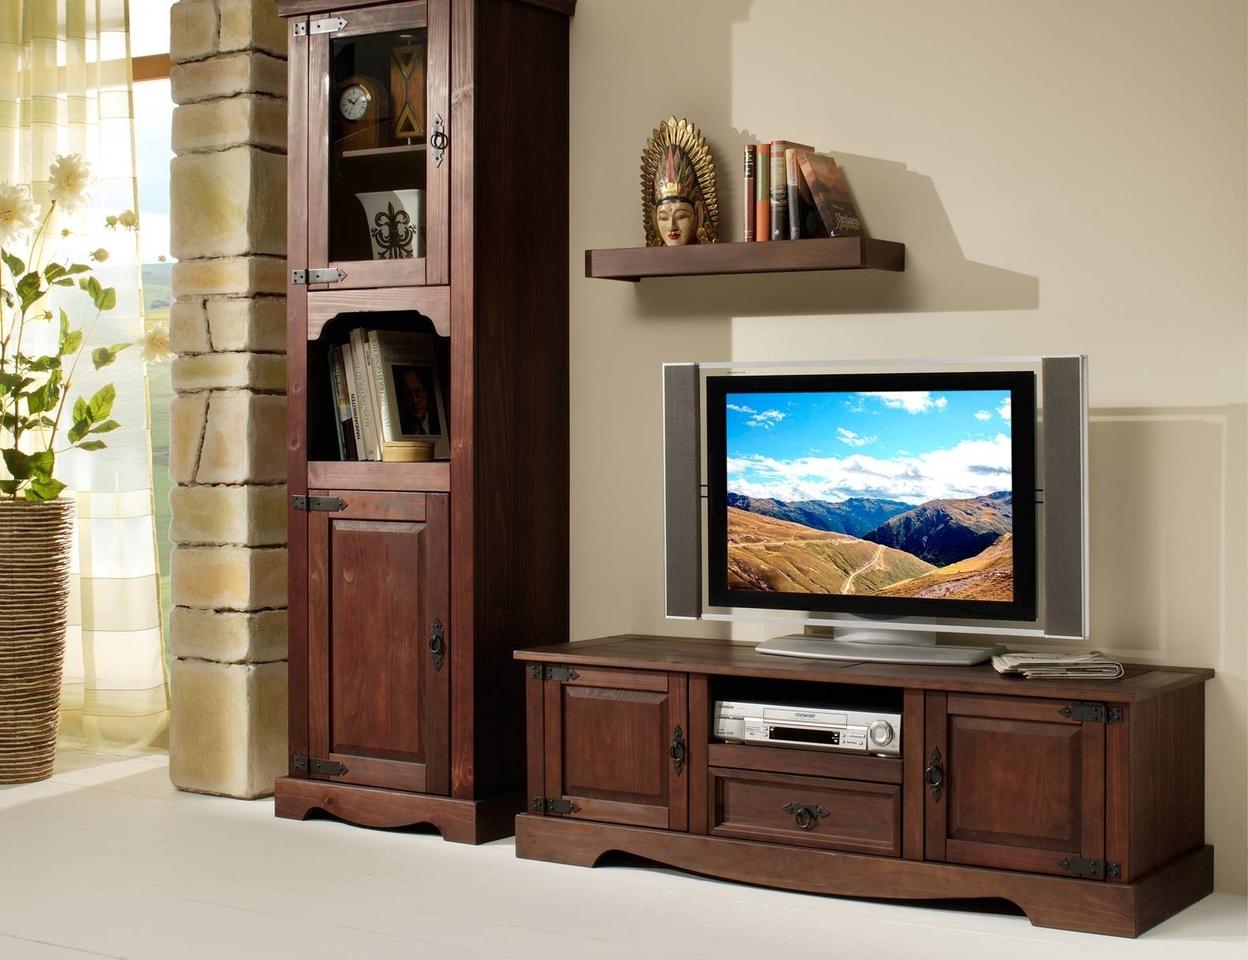 tv board mexican von henke g nstig bestellen skanm bler. Black Bedroom Furniture Sets. Home Design Ideas